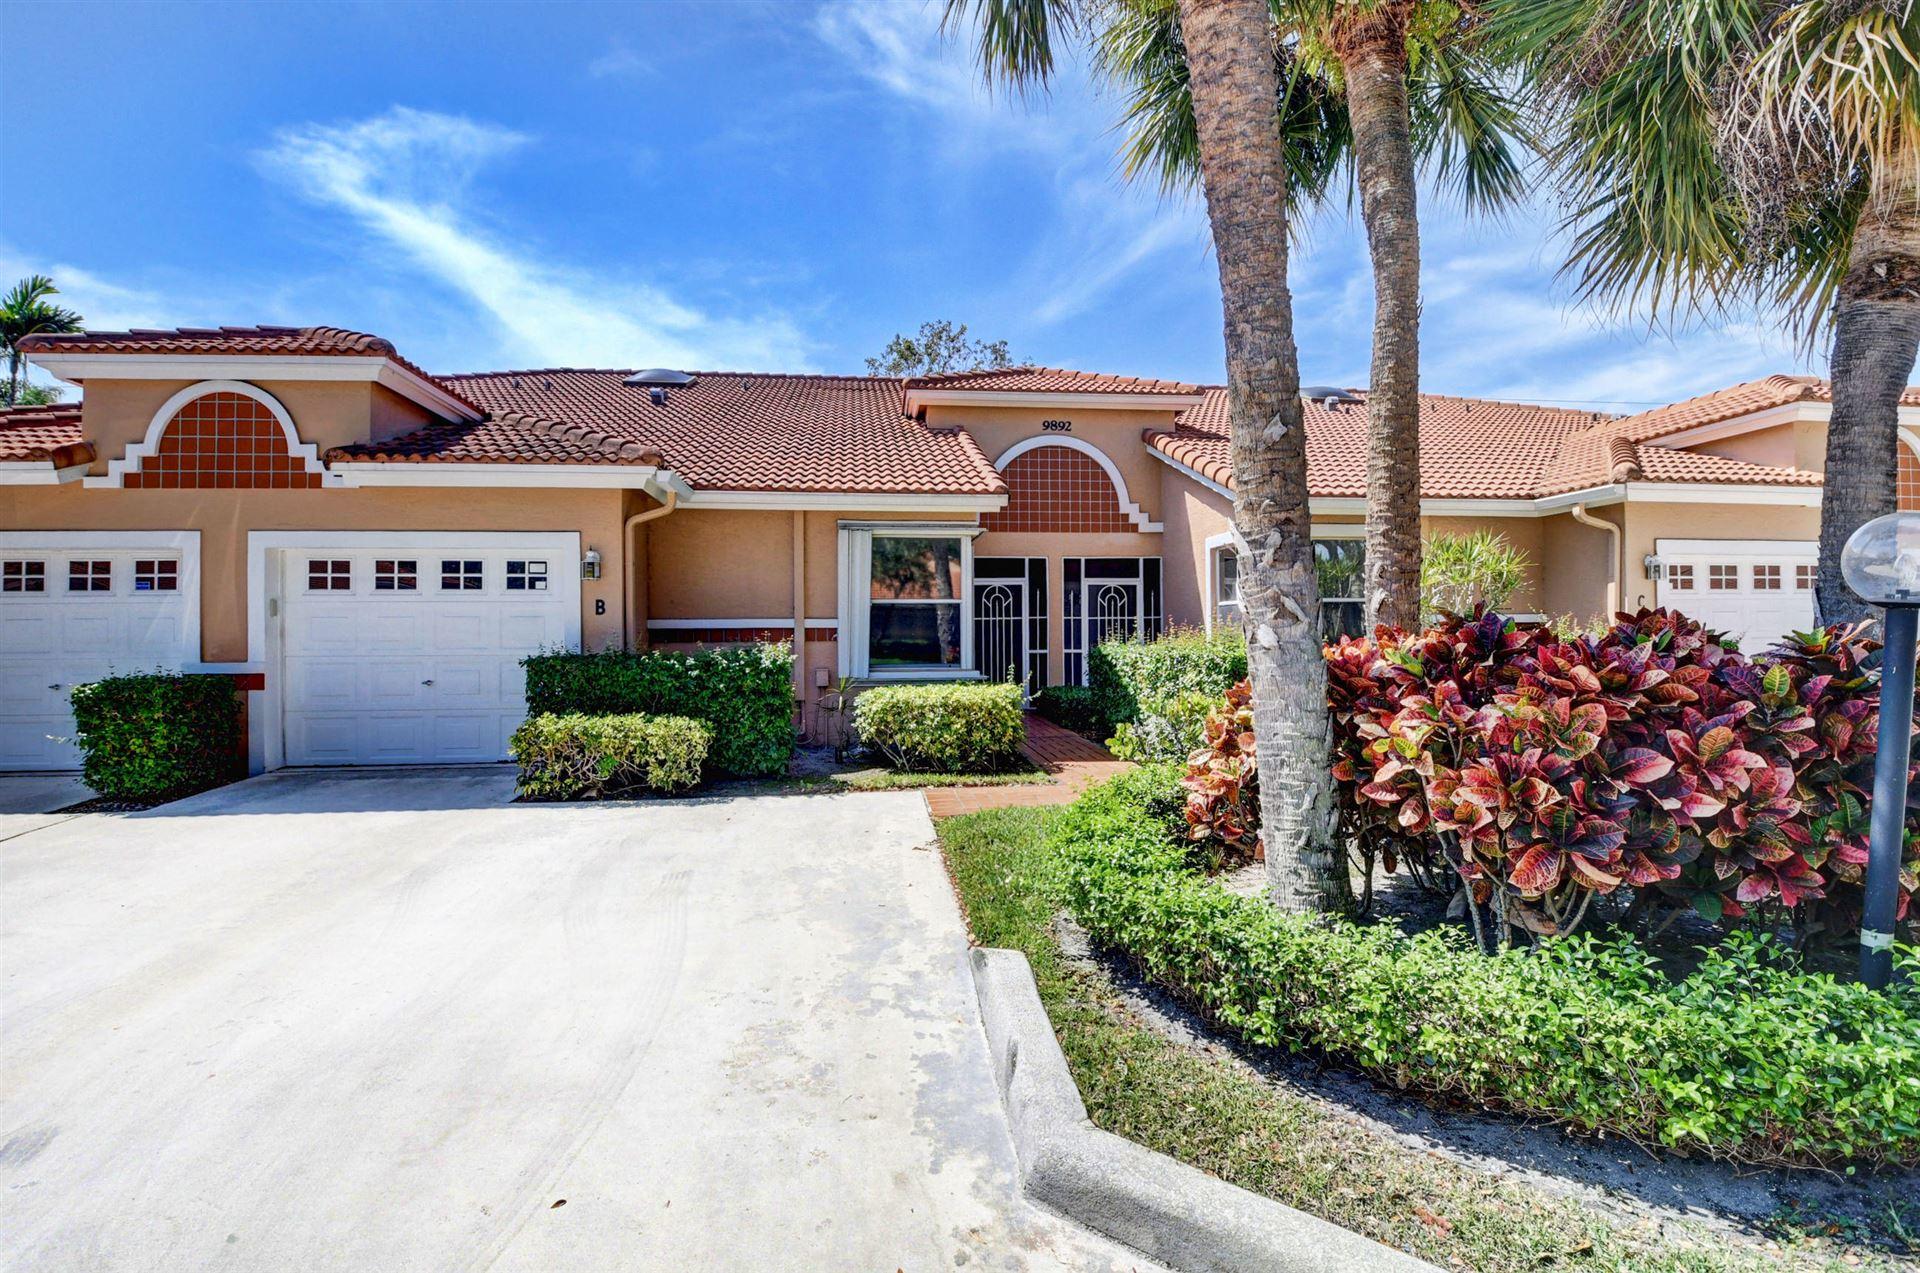 9892 Summerbrook Terrace #B, Boynton Beach, FL 33437 - MLS#: RX-10706555